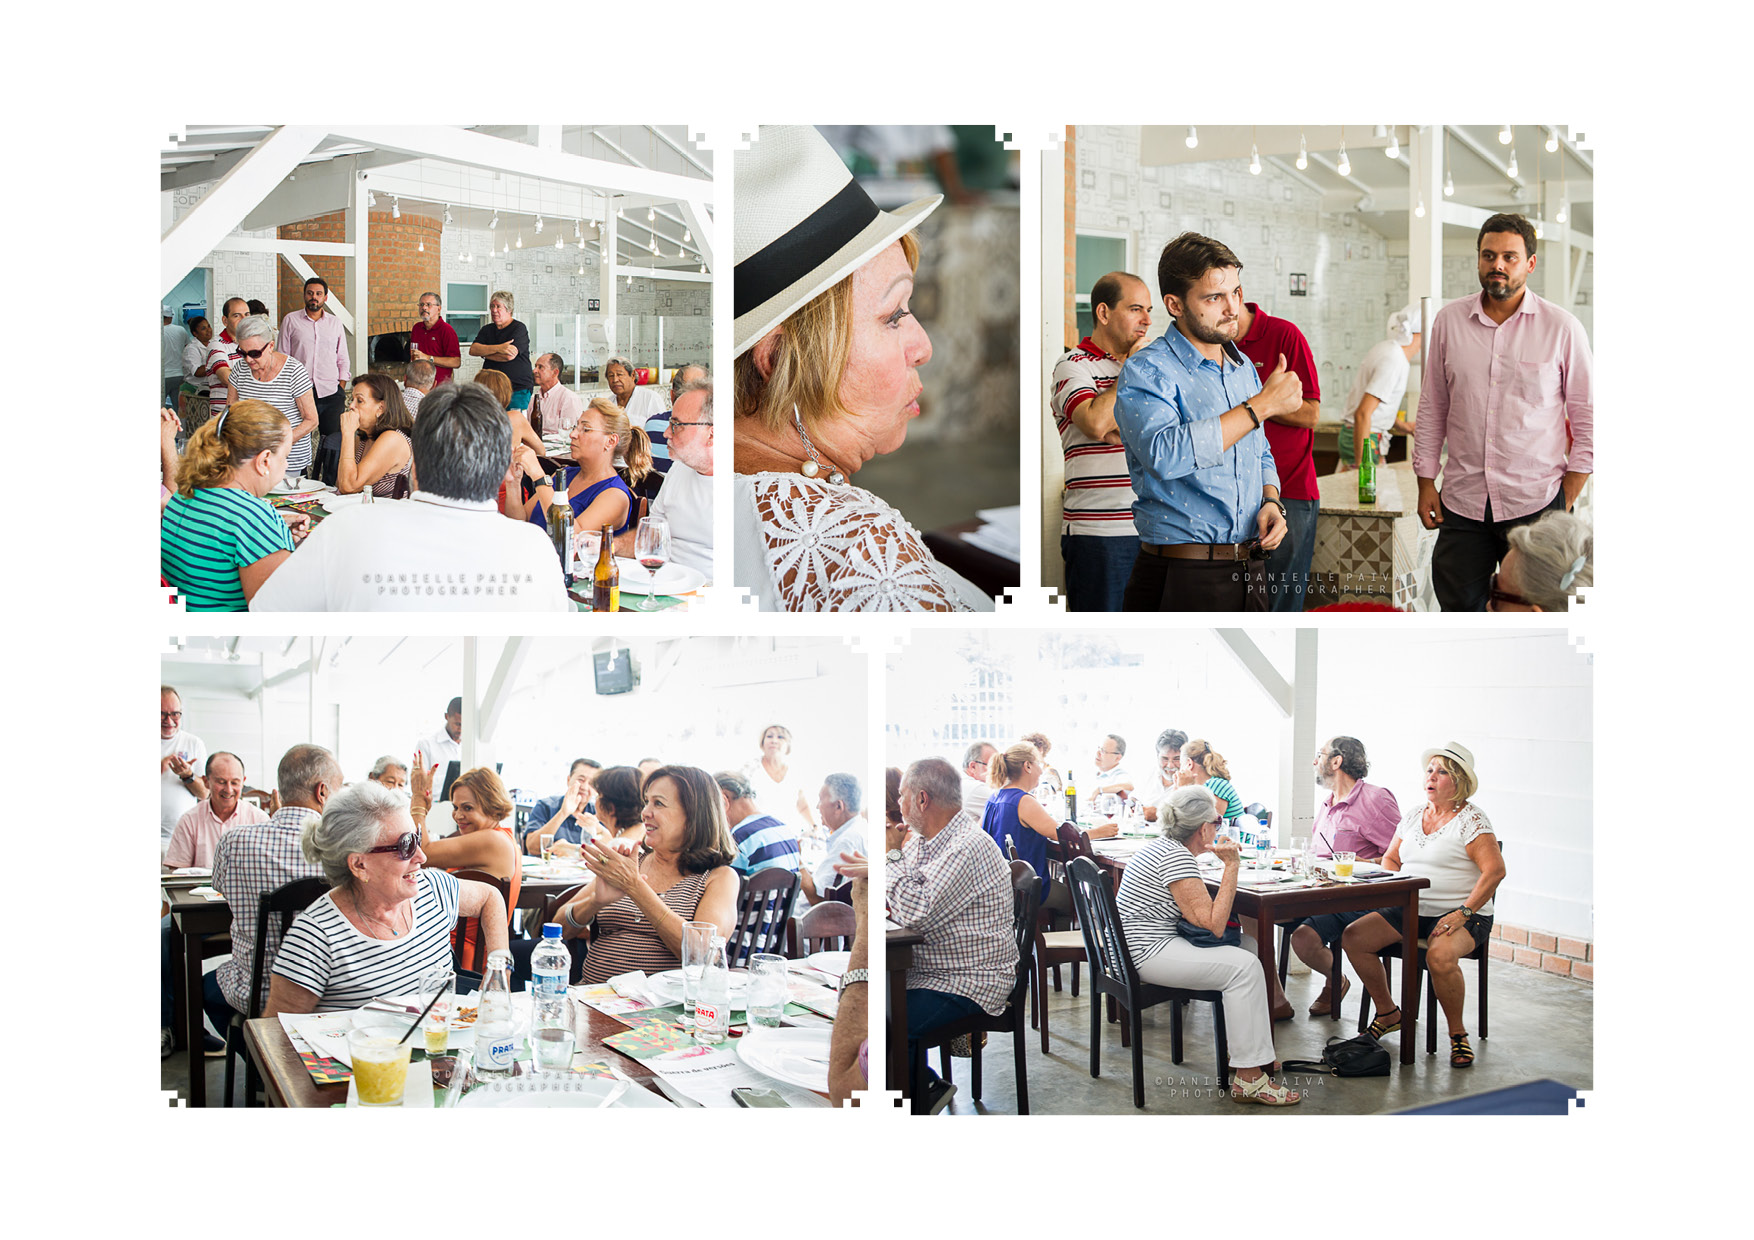 festa-niteroi-restaurante-eventos-tra-i-gusti